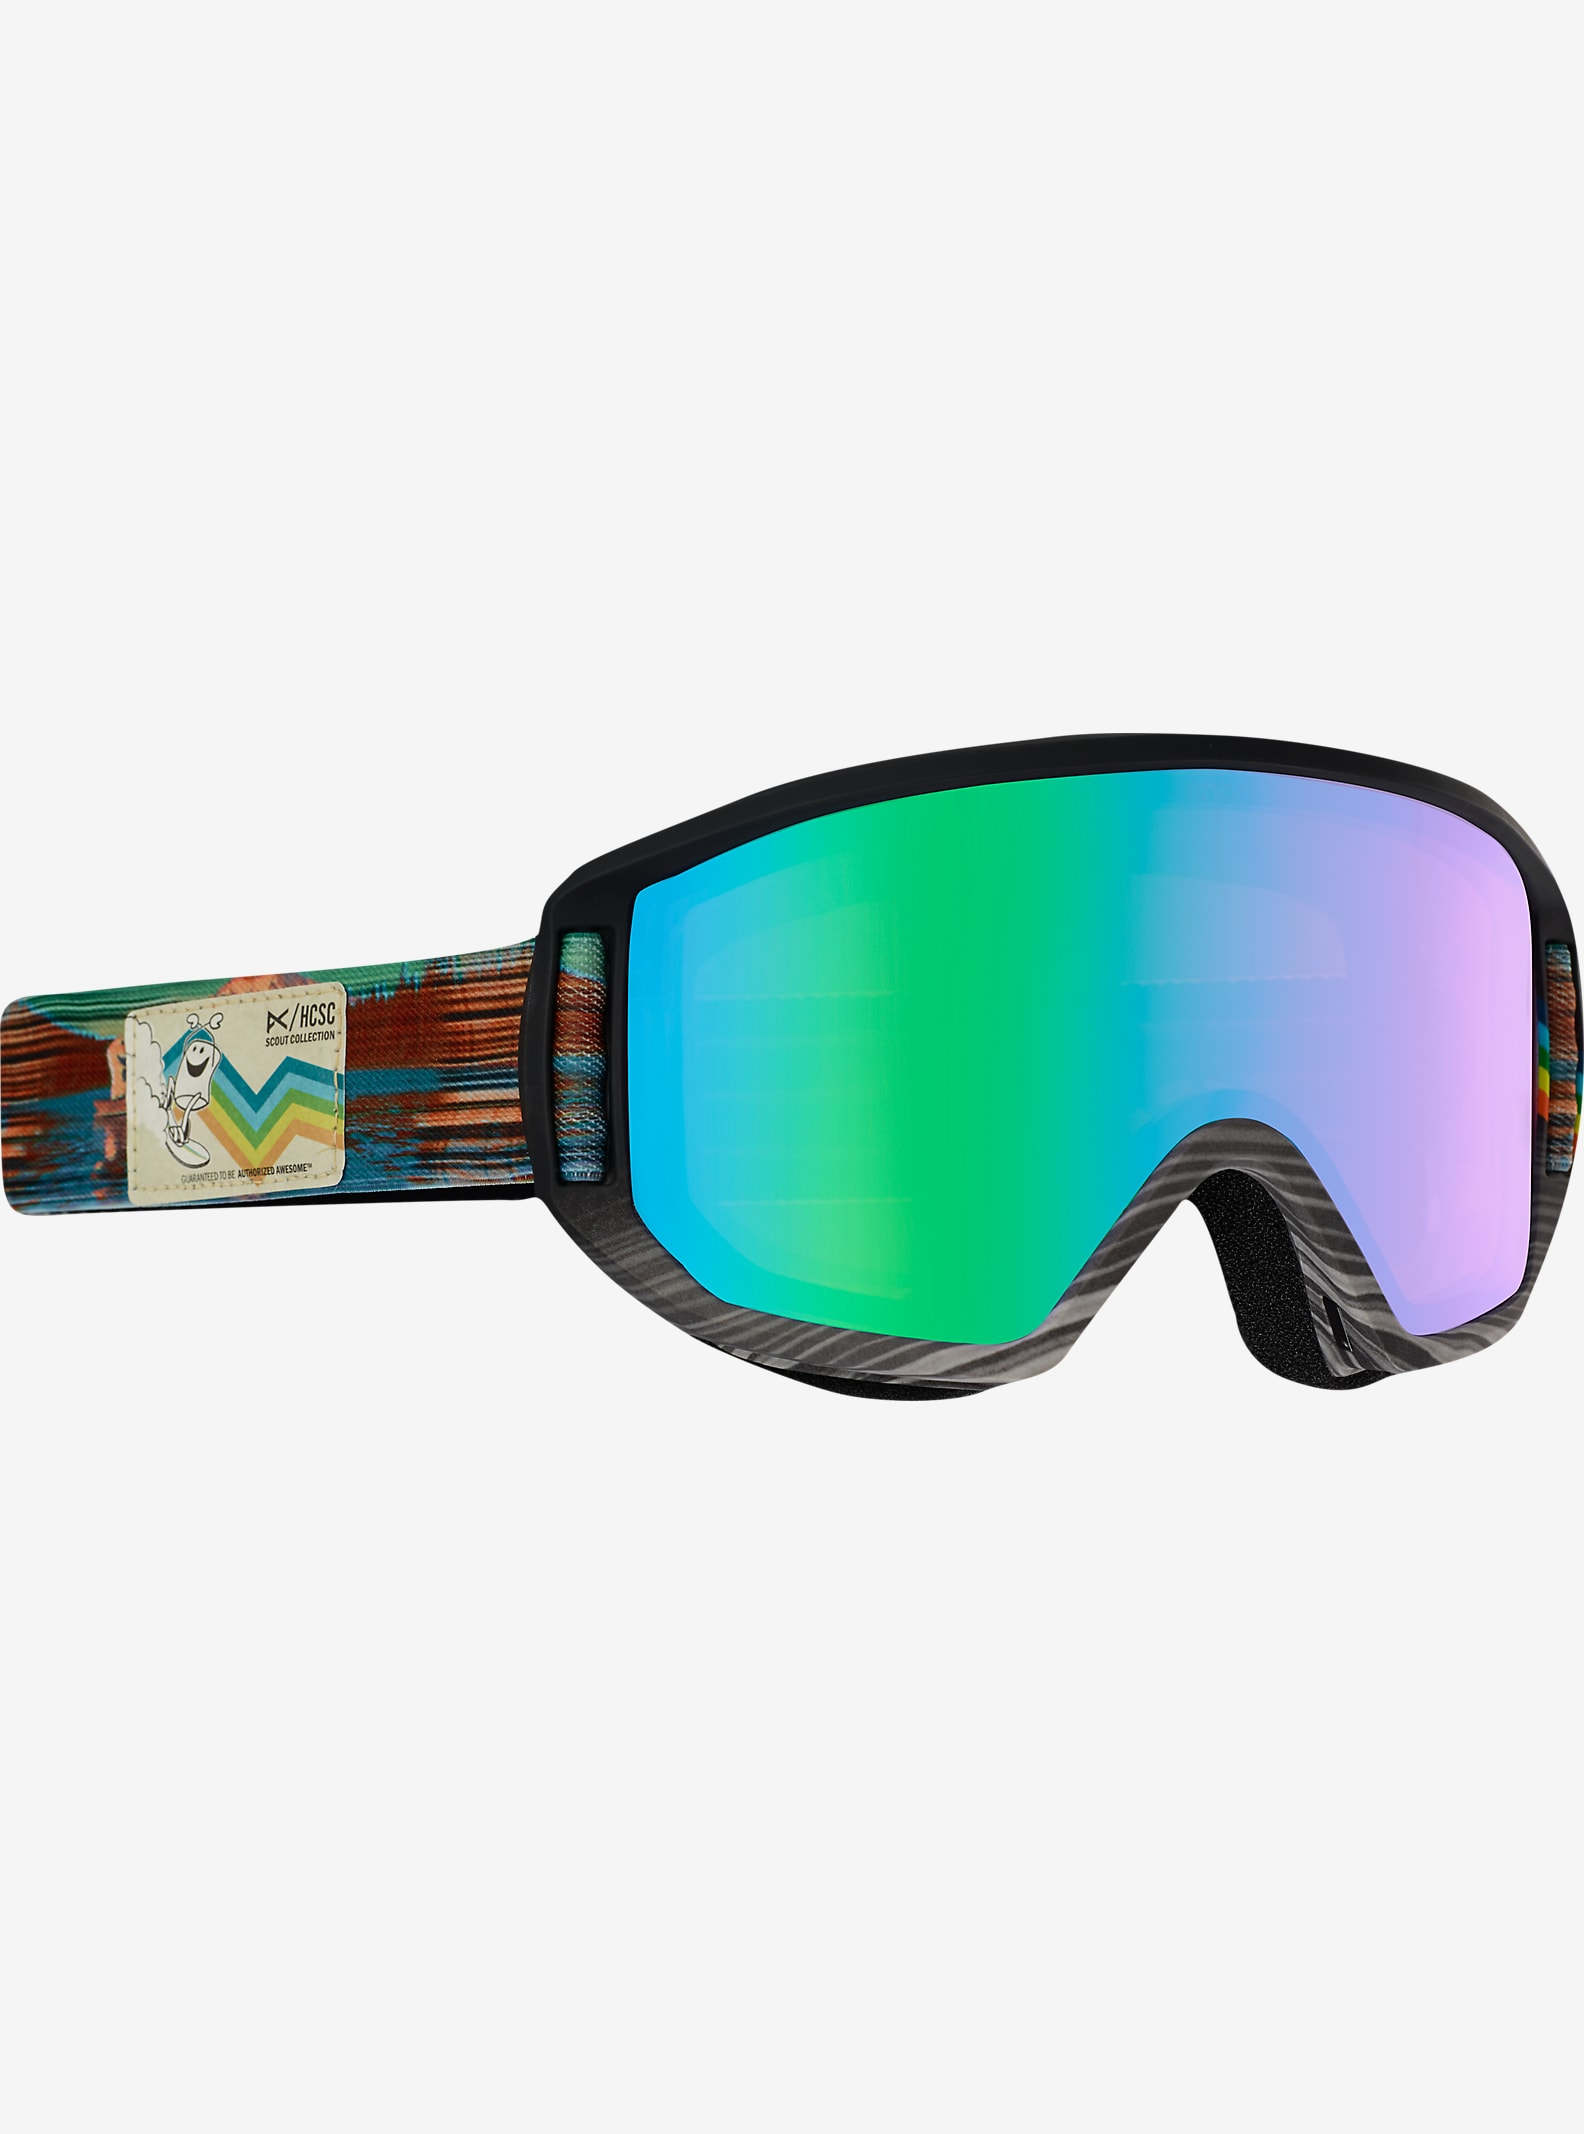 HCSC x anon. Relapse Goggle angezeigt in Rahmen: HCSC, Brillenglas: Green Solex